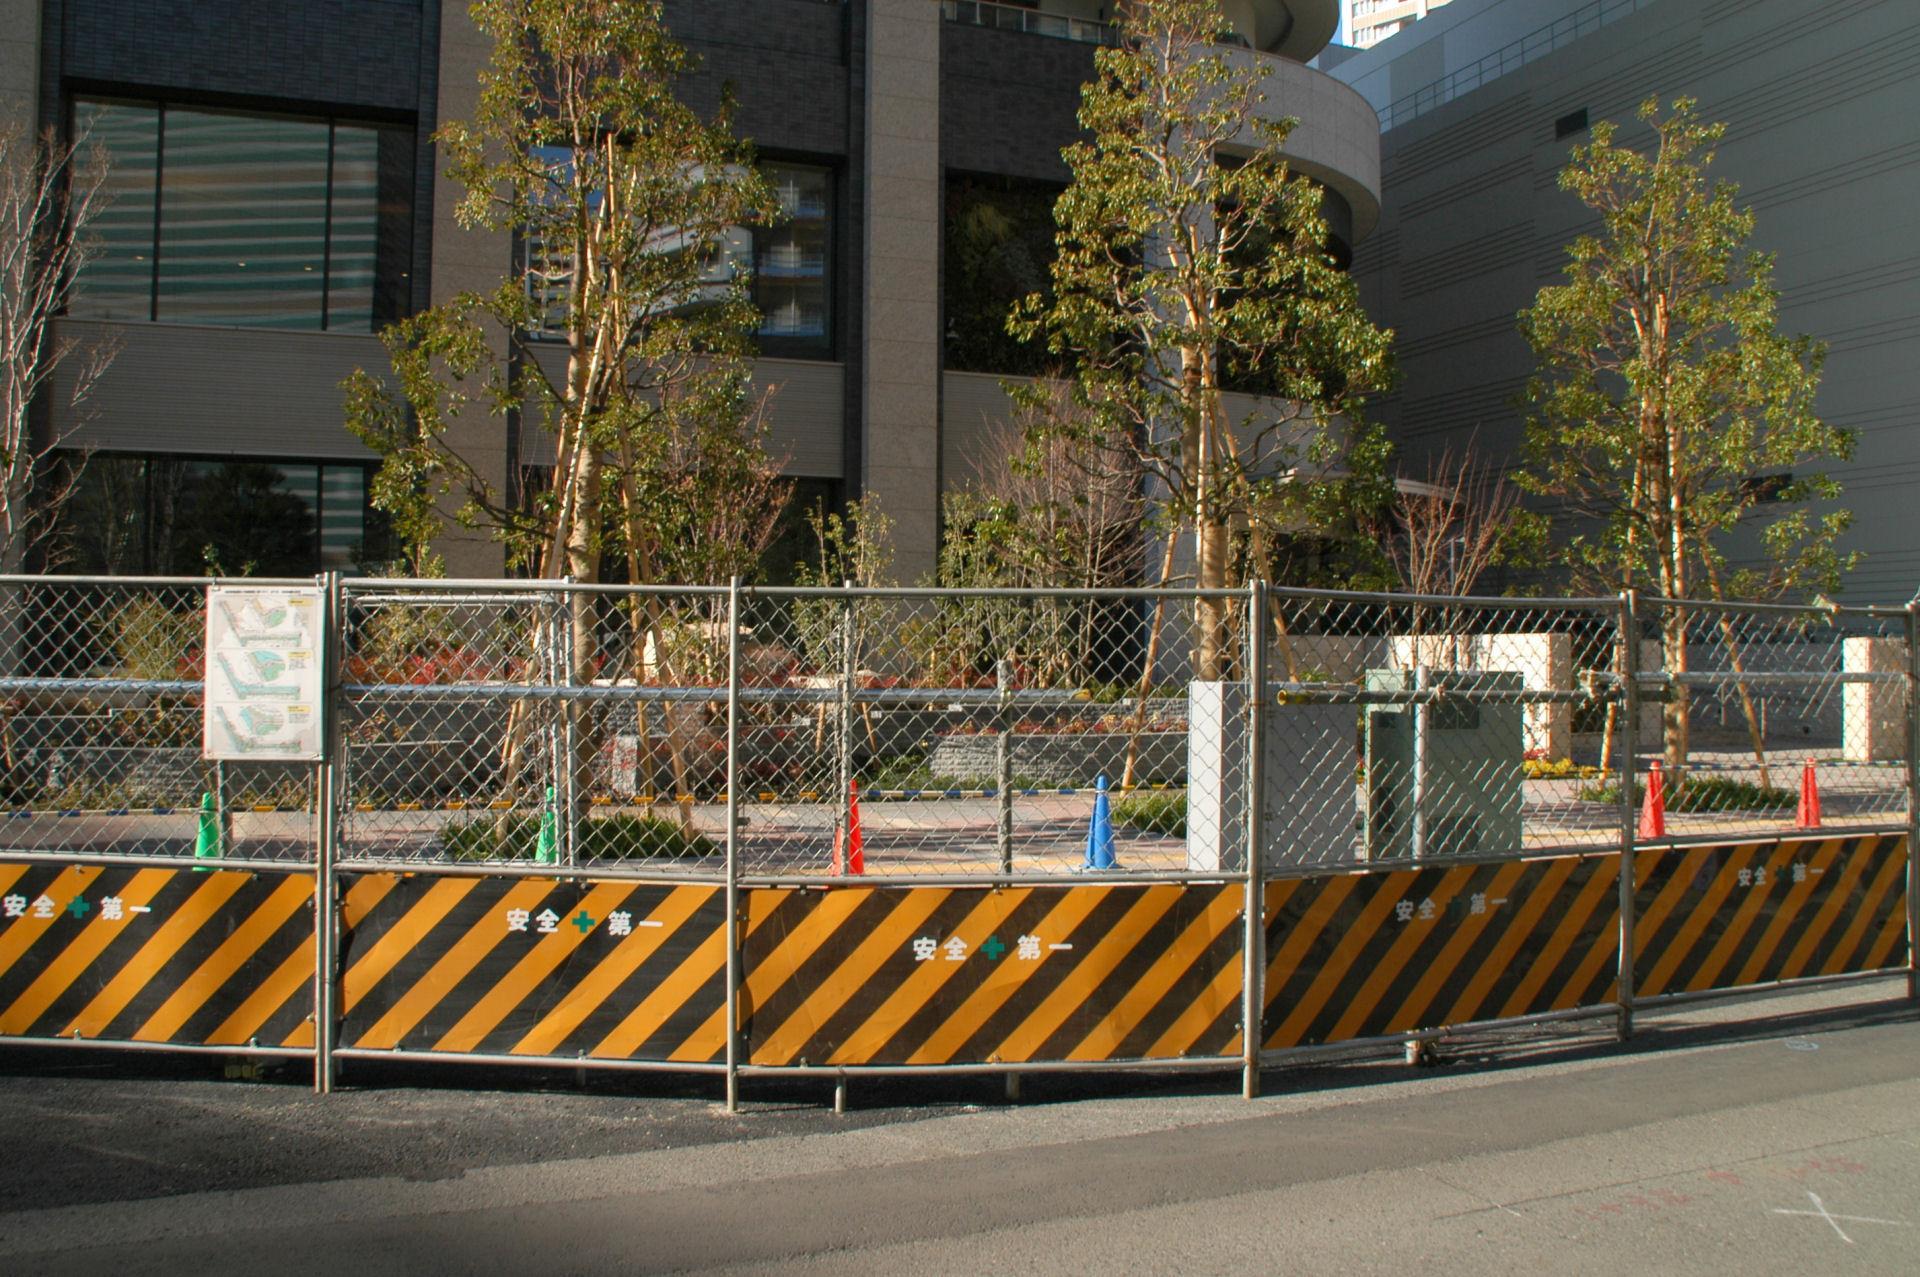 musakosu13120104.jpg